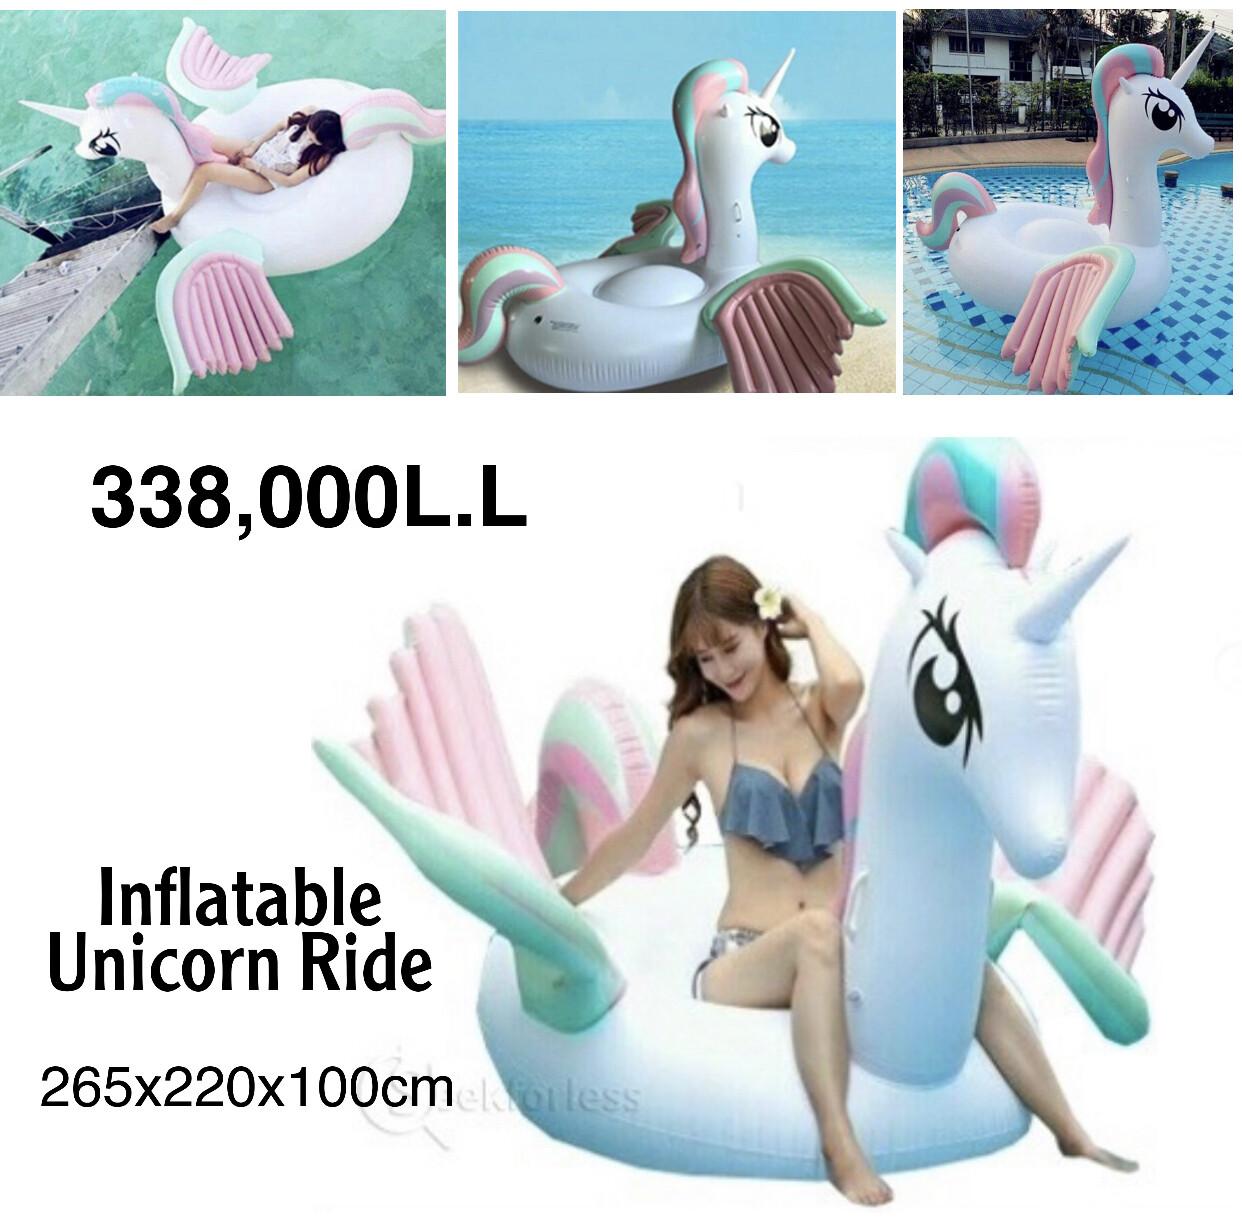 Inflatable Unicorn Ride